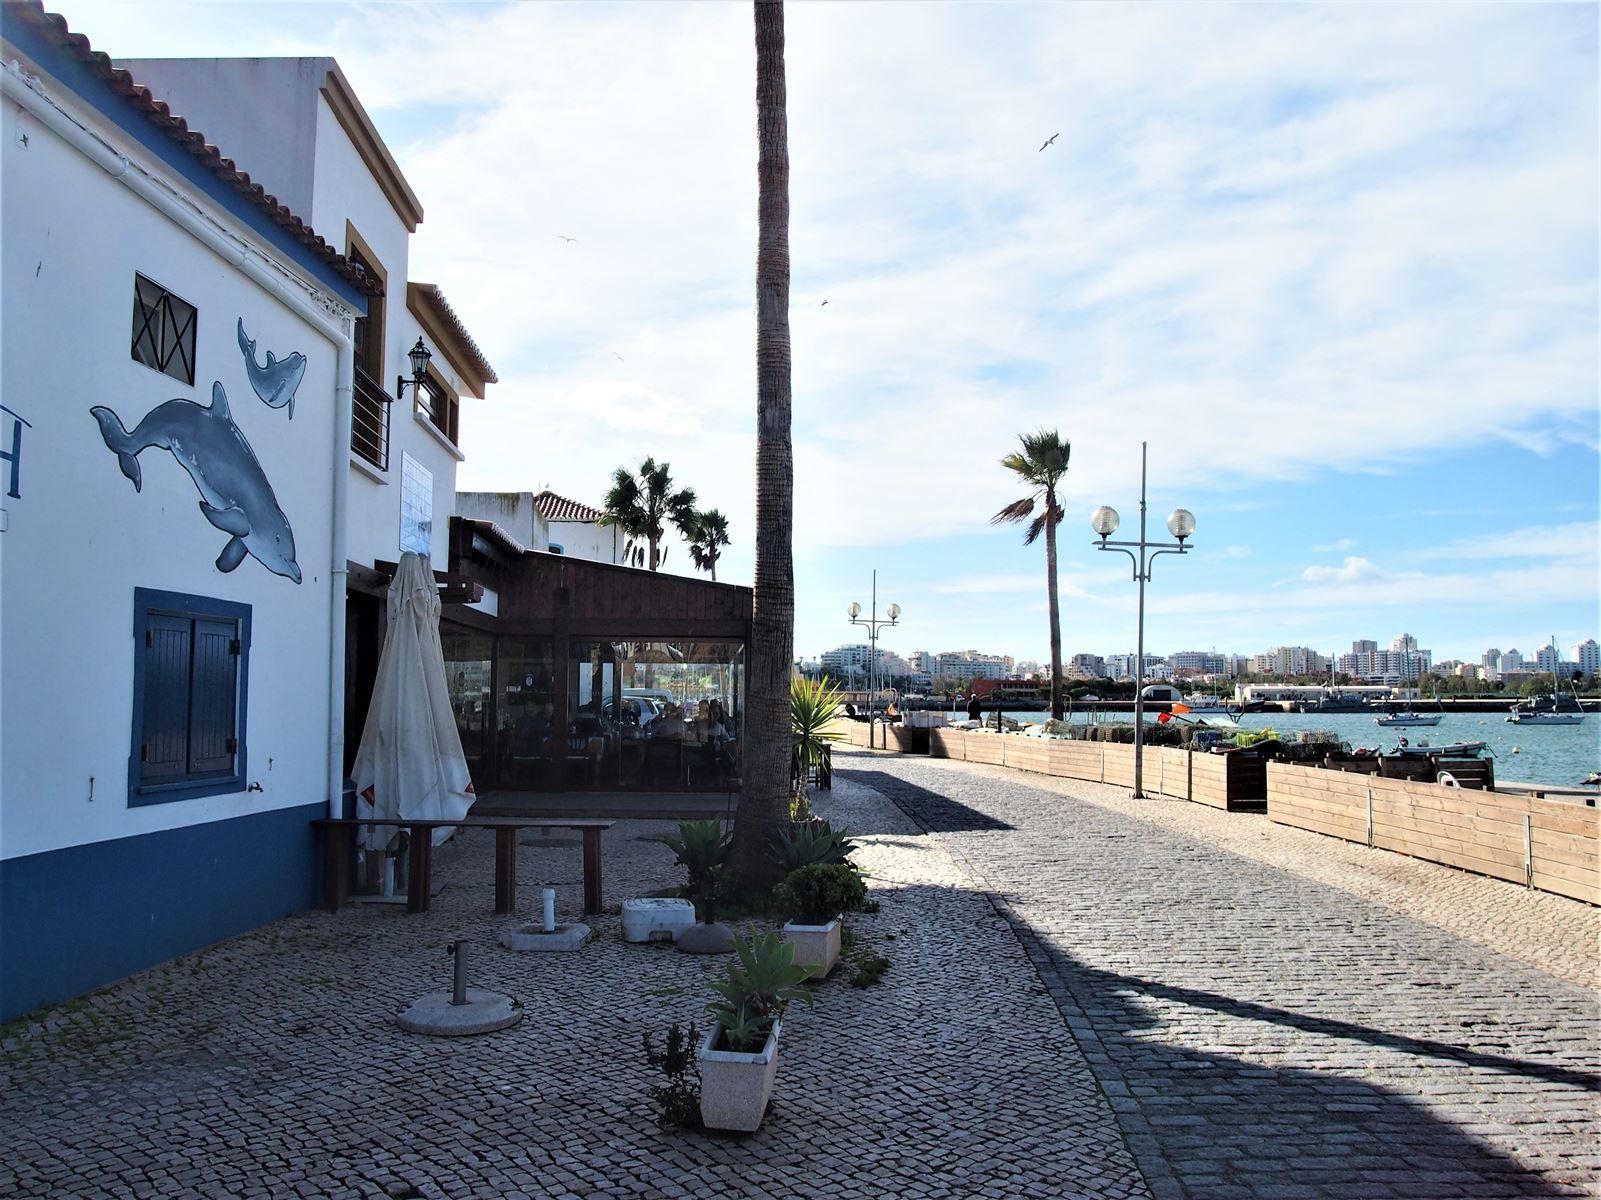 Promenade at Ferragudo, Algarve